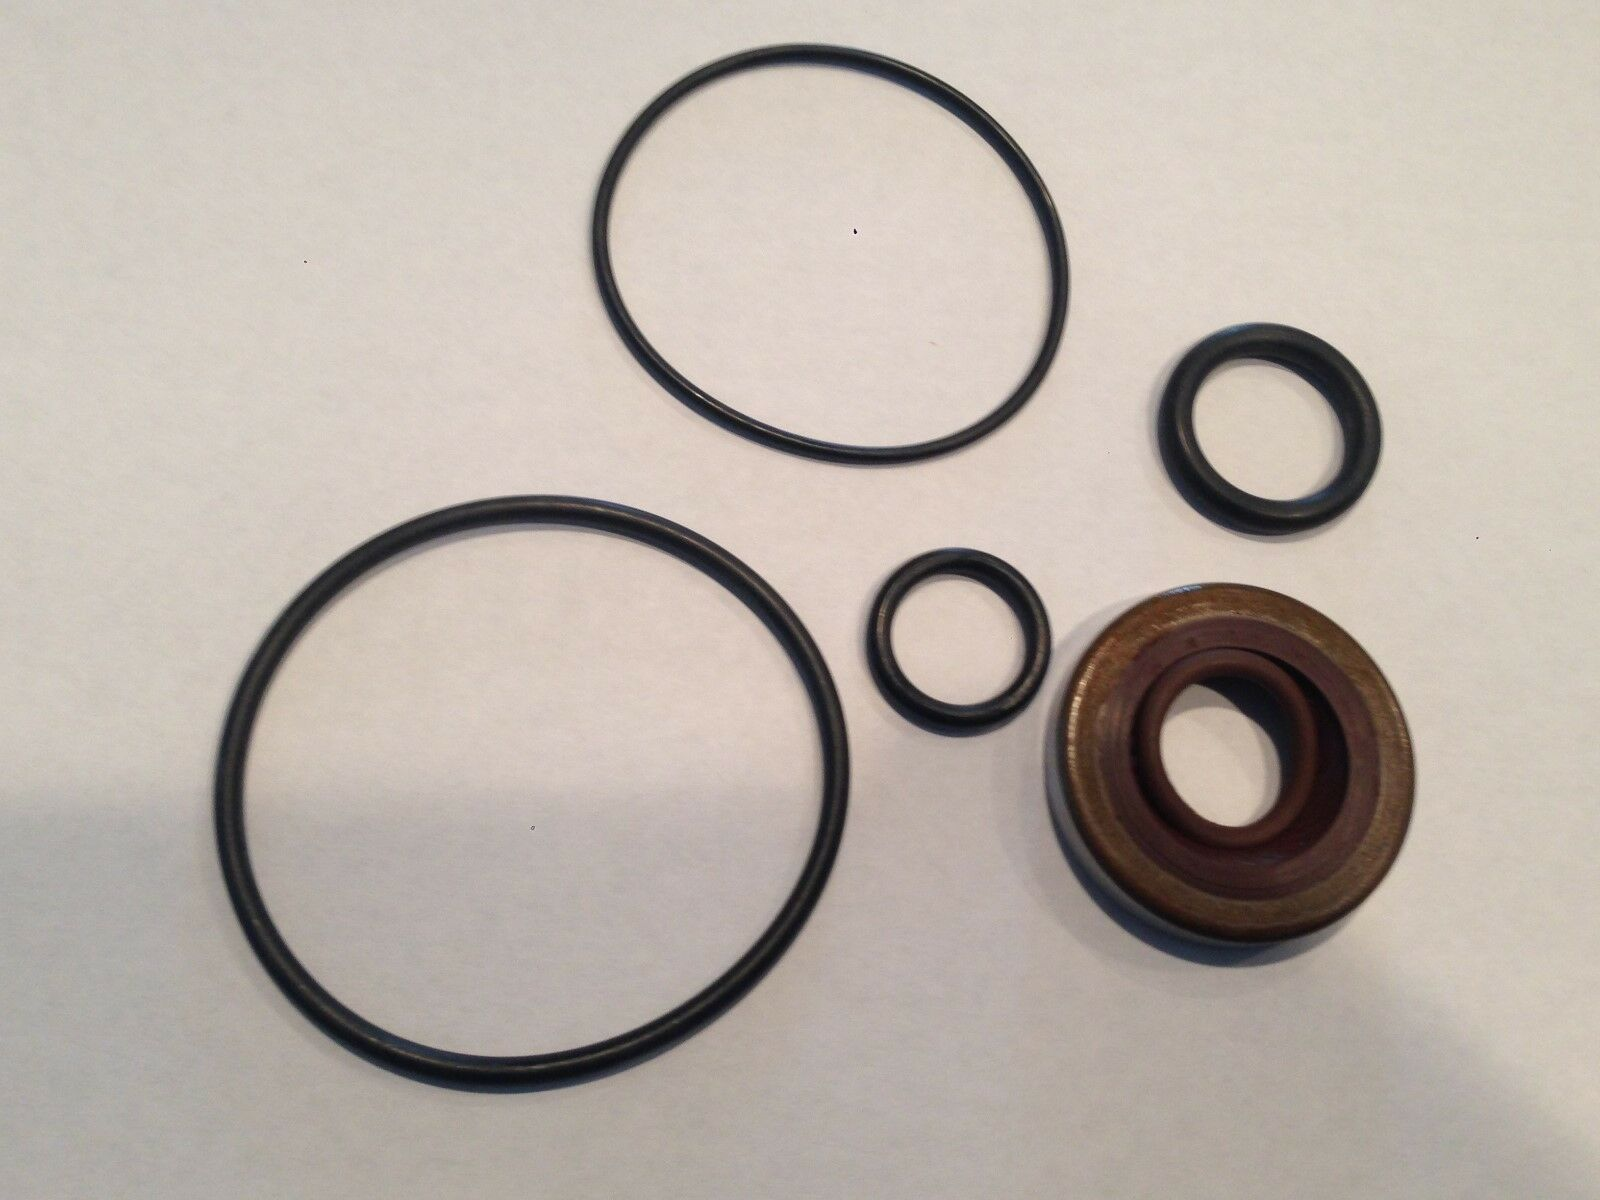 Power Steering Pump Seal Kit Gates 348379 Ebay Honda Accord Fluid Leak